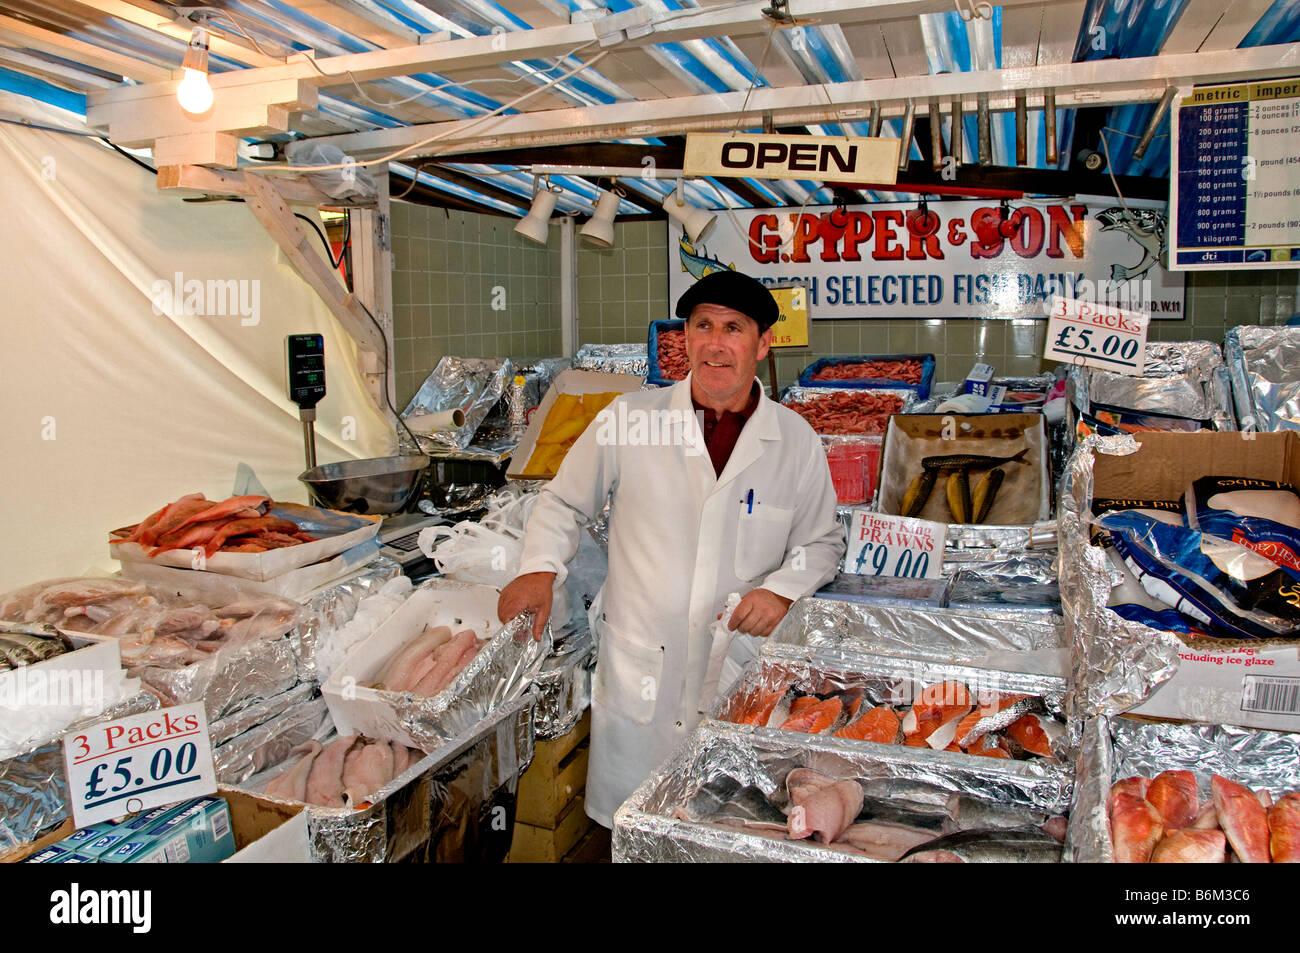 Portobello Road Market Notting Hill London Fish Monger G Piper and Son Stock Photo